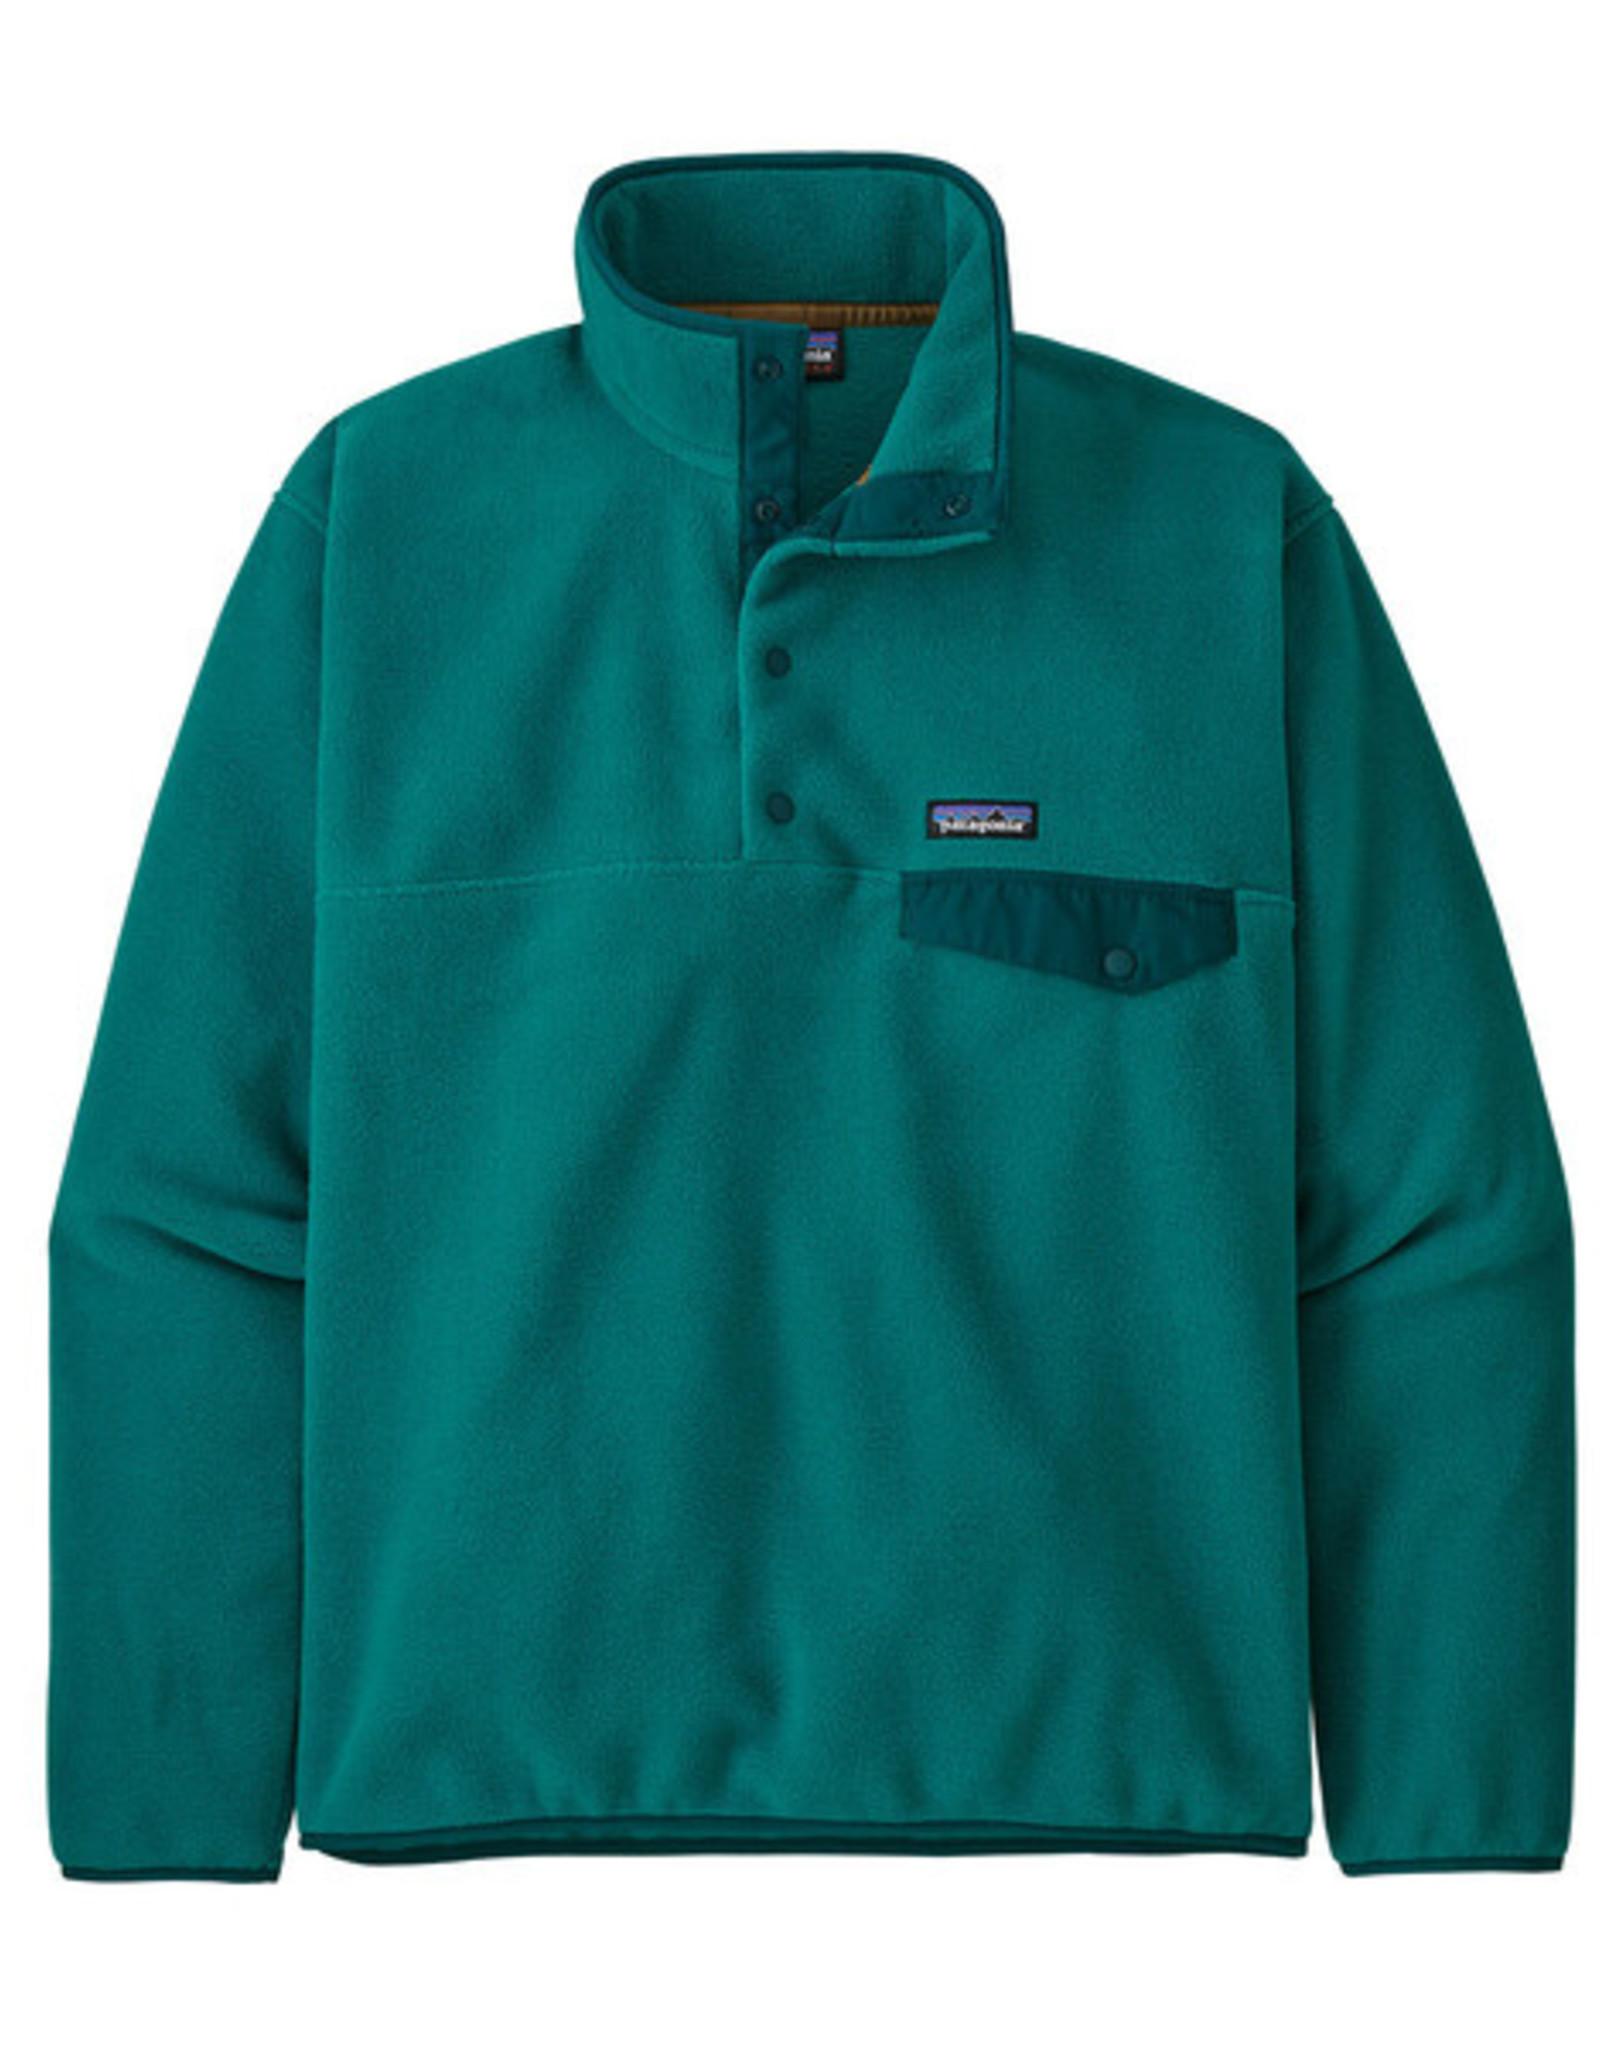 Patagonia - M's LW Synch Snap-T -  Borealis Green